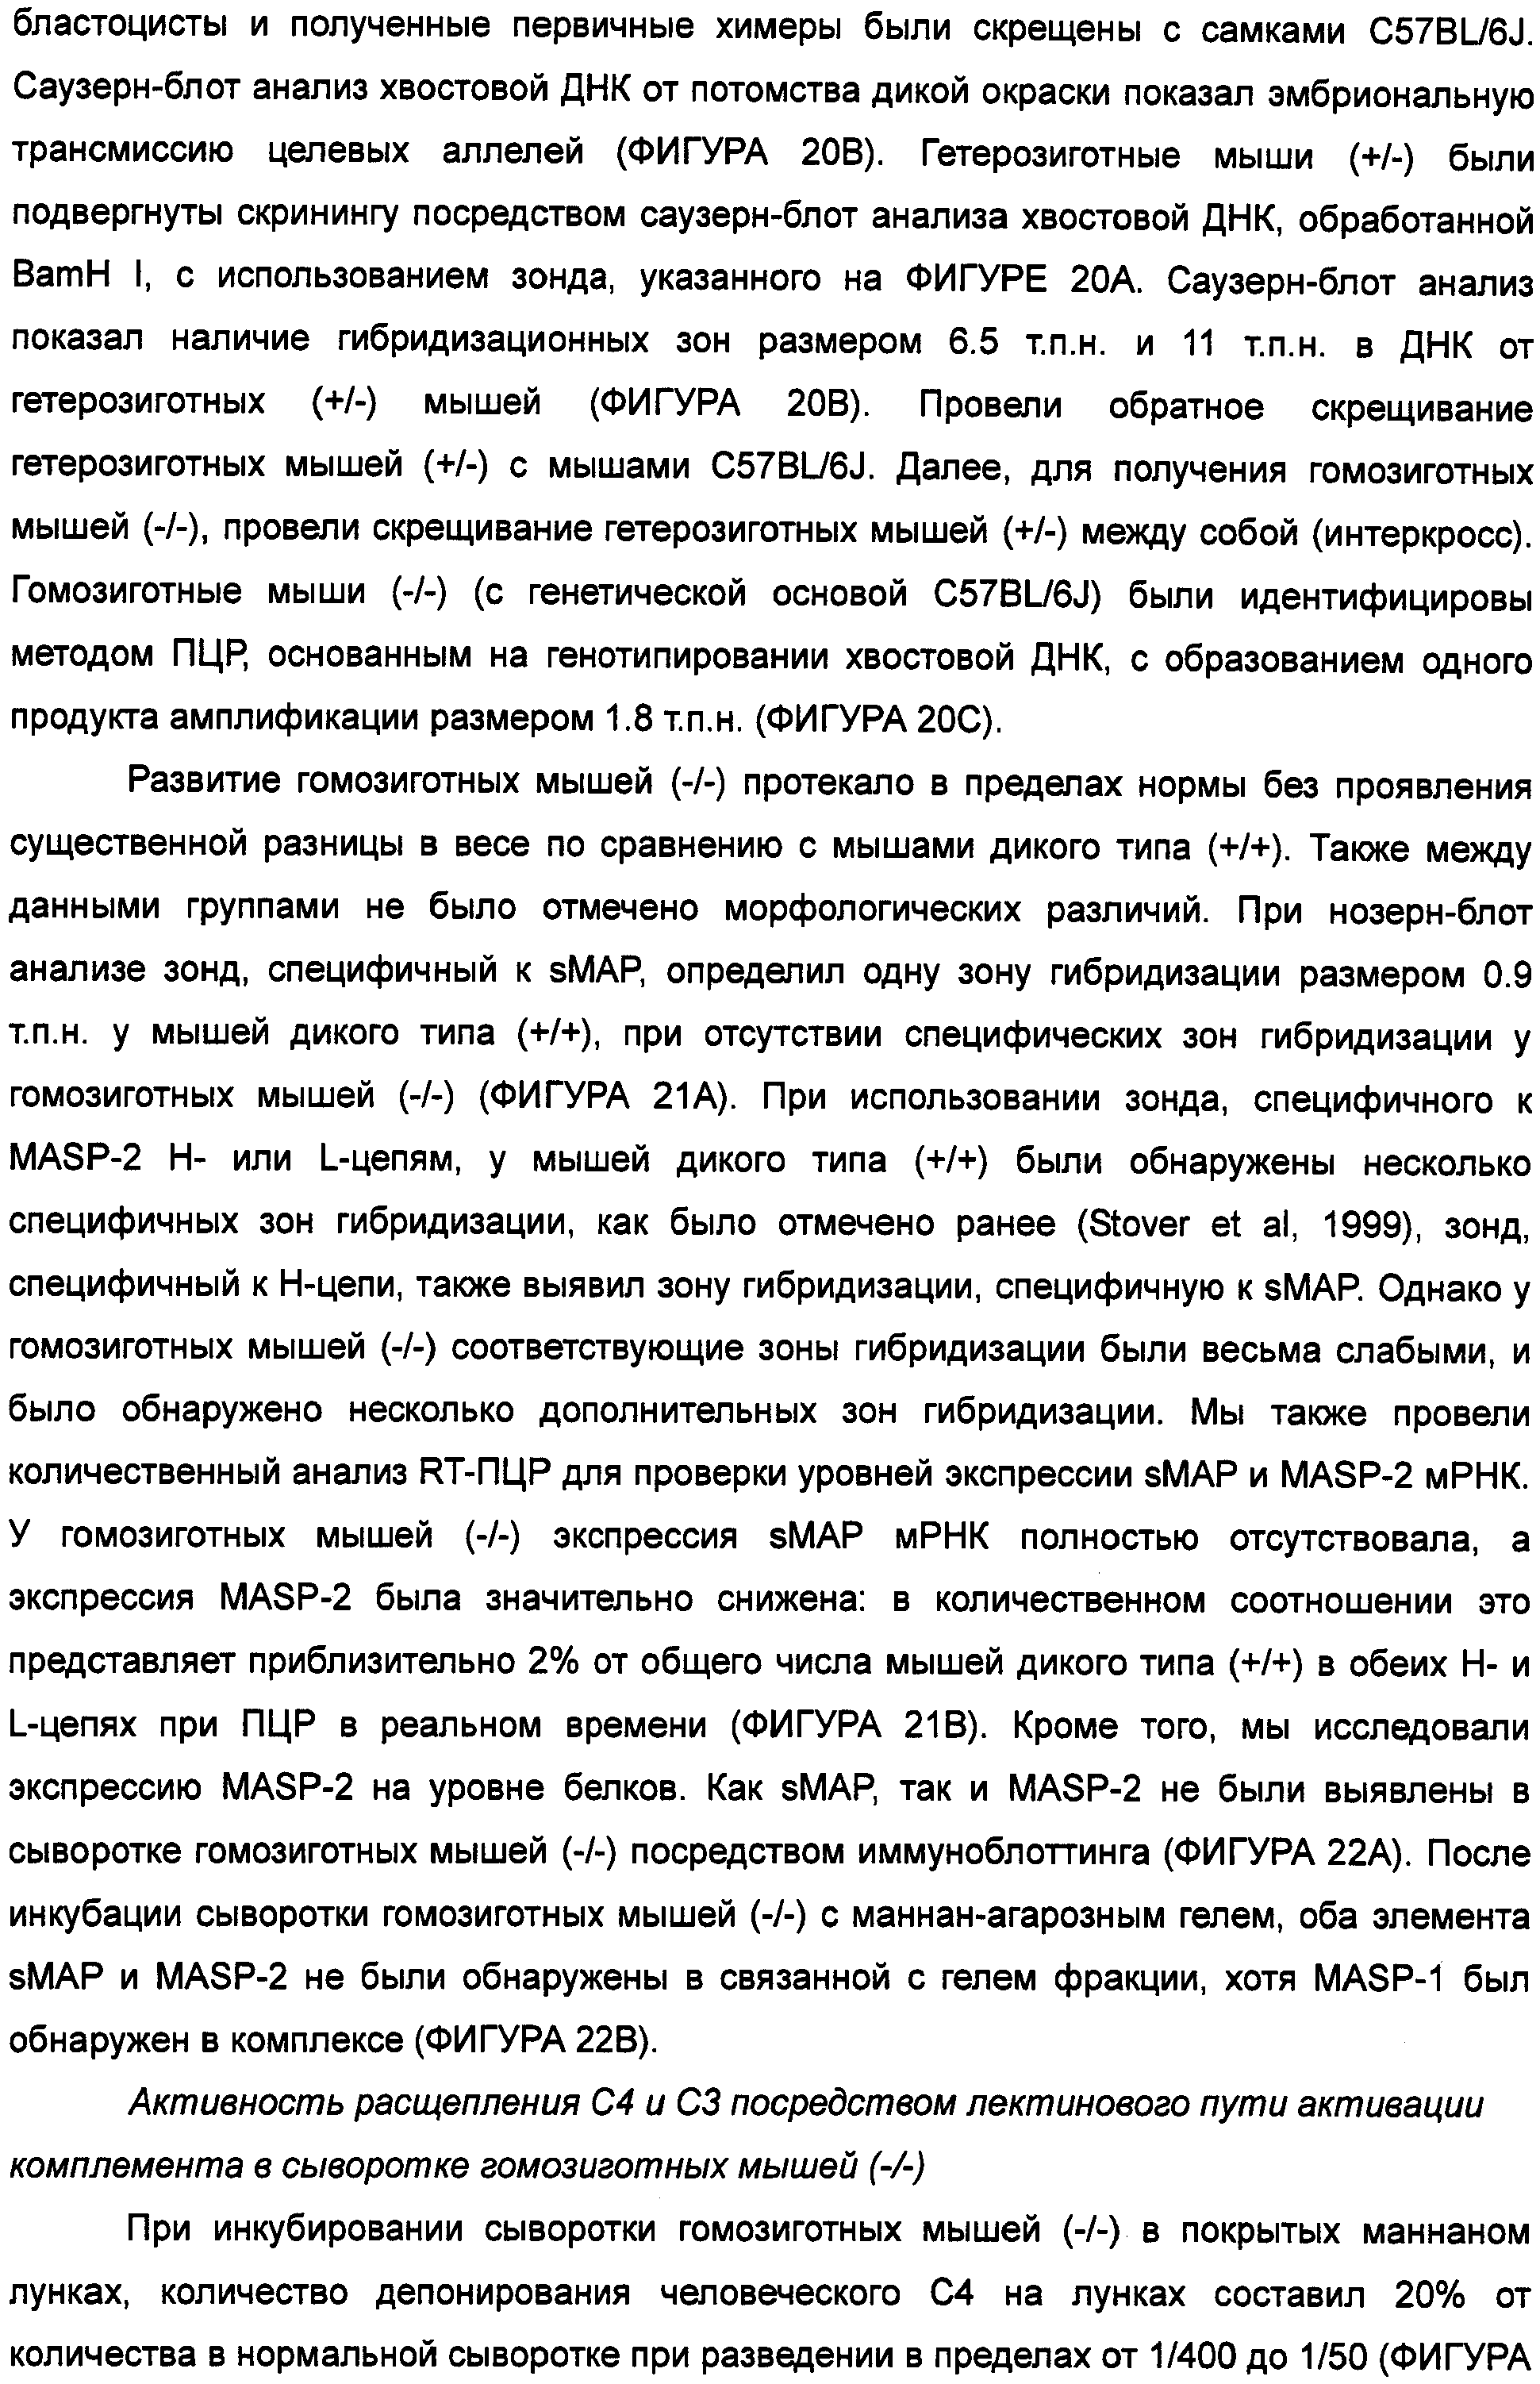 Figure 00000182